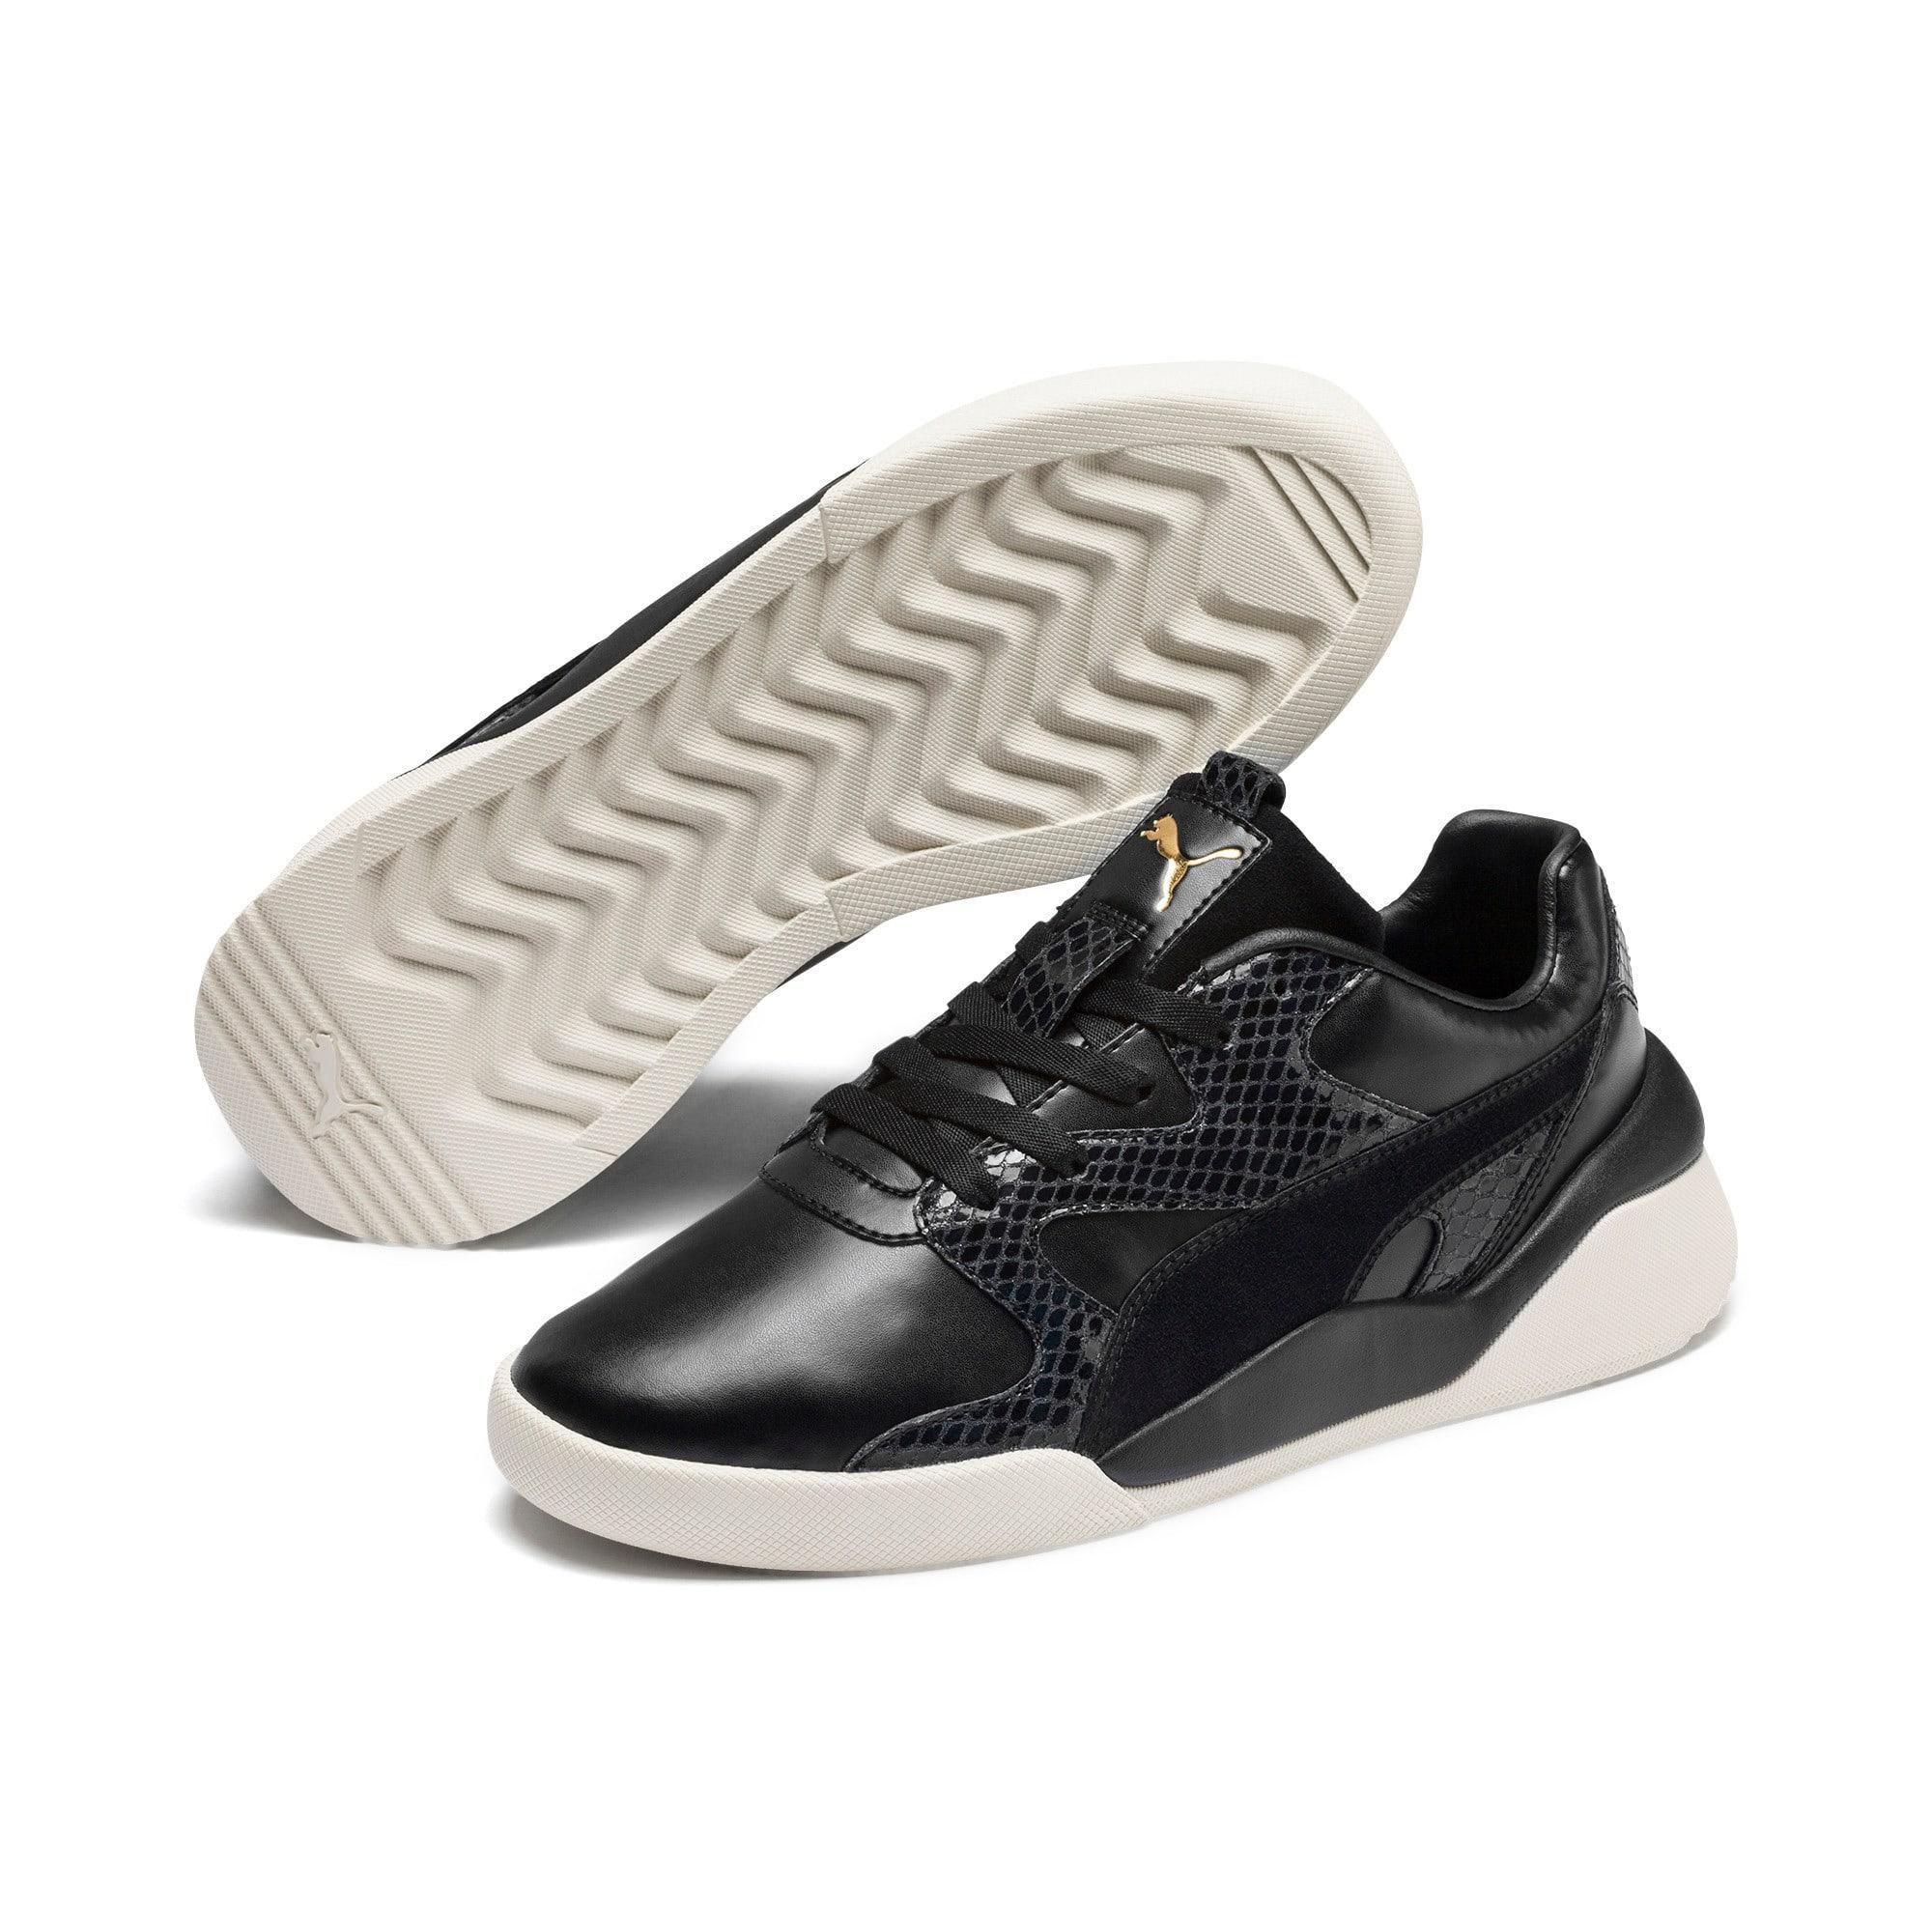 Thumbnail 3 of Aeon Play Women's Sneakers, Puma Black, medium